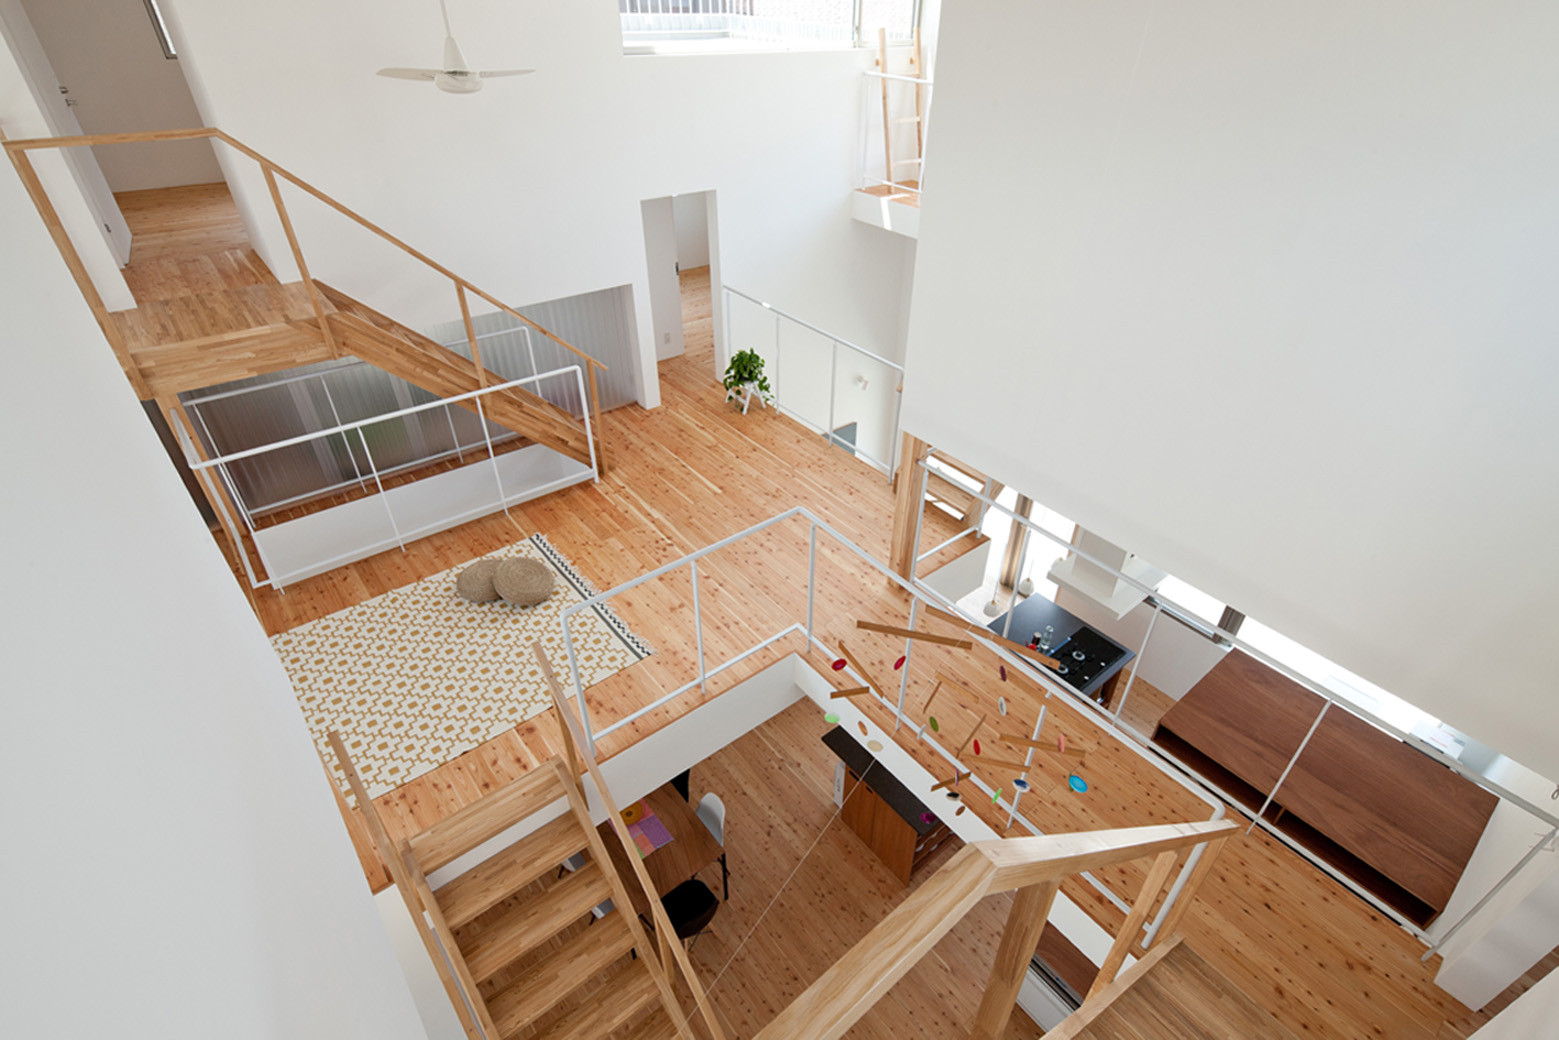 LT Josai / Naruse Inokuma Architects | ArchDaily